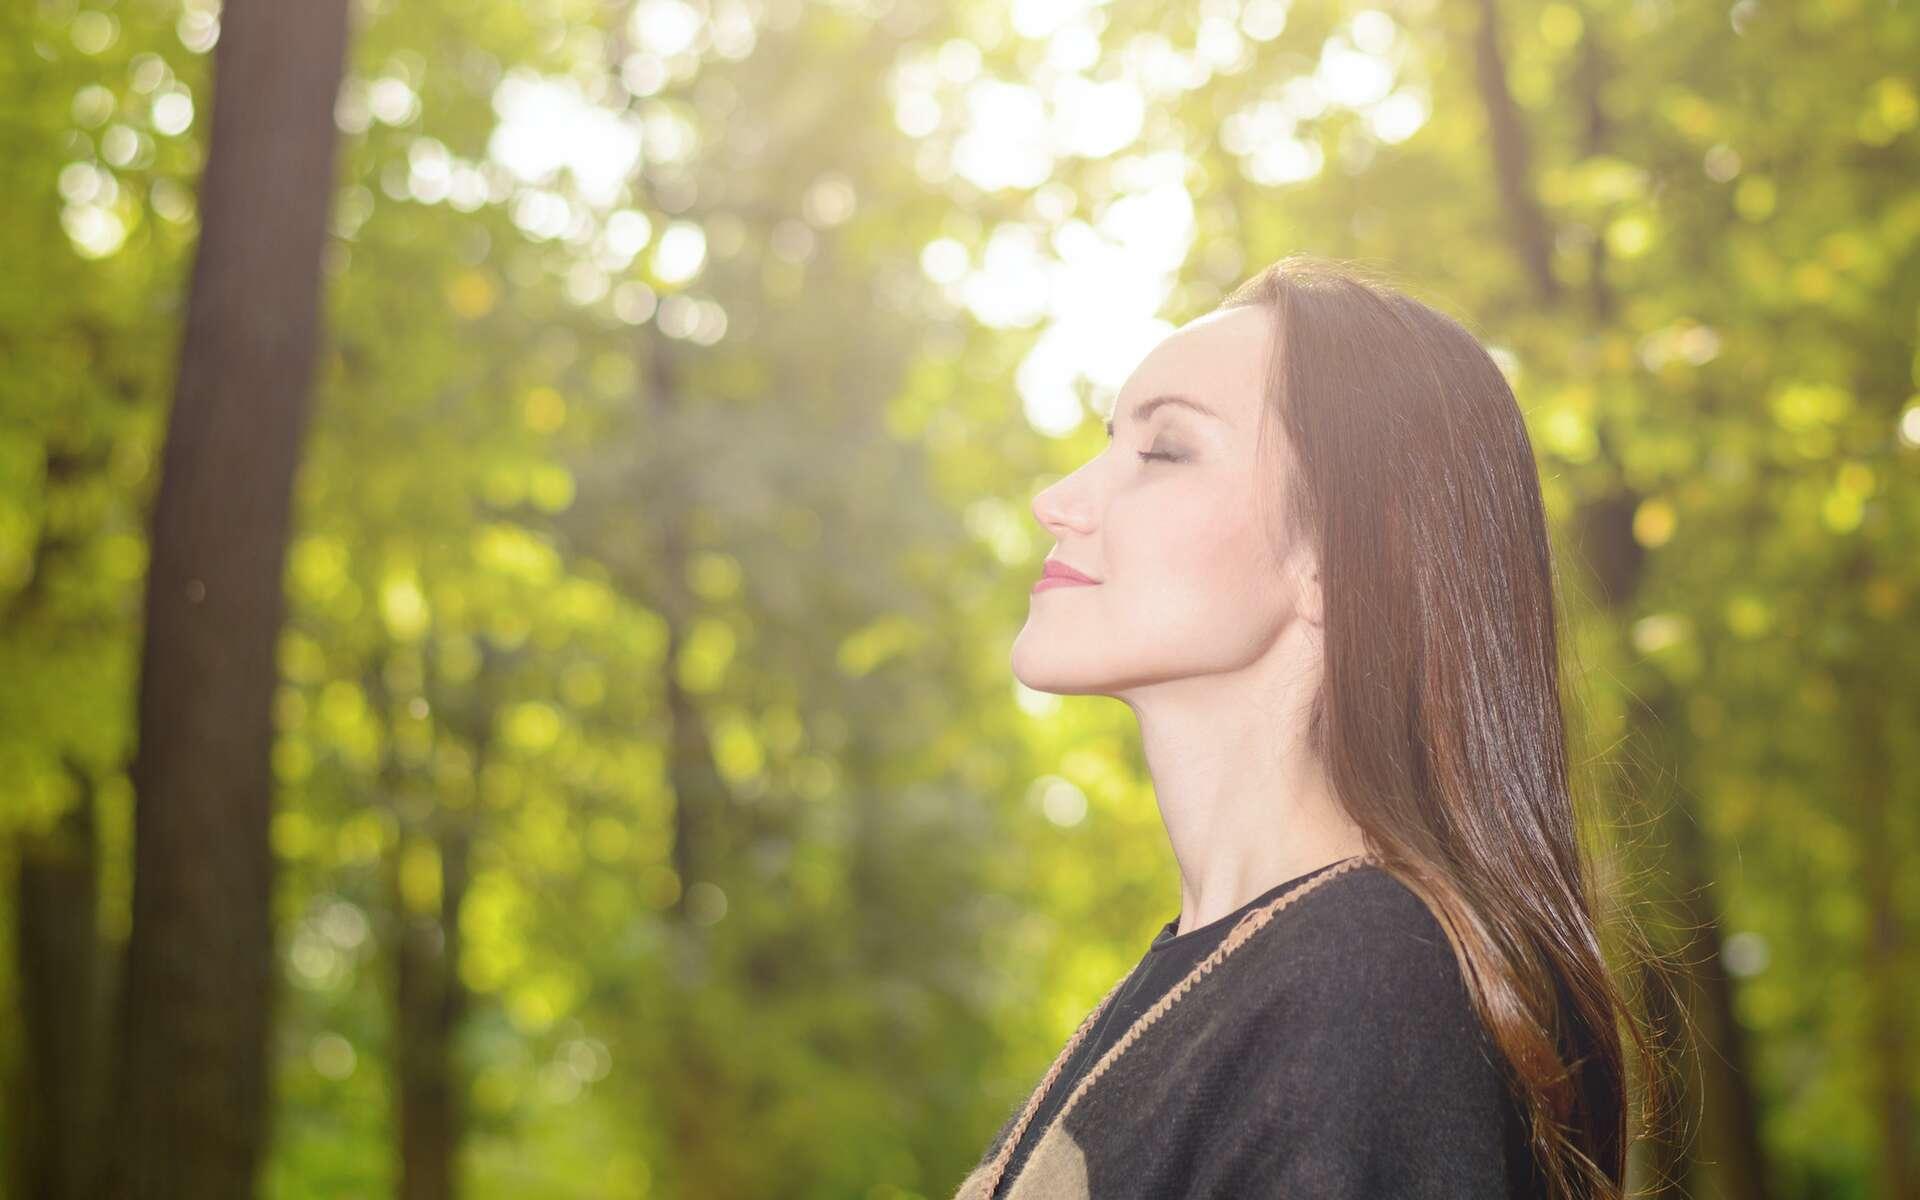 La respiration absorbe de l'oxygène et émet du CO2. © Руслан Галиуллин, Adobe Stock